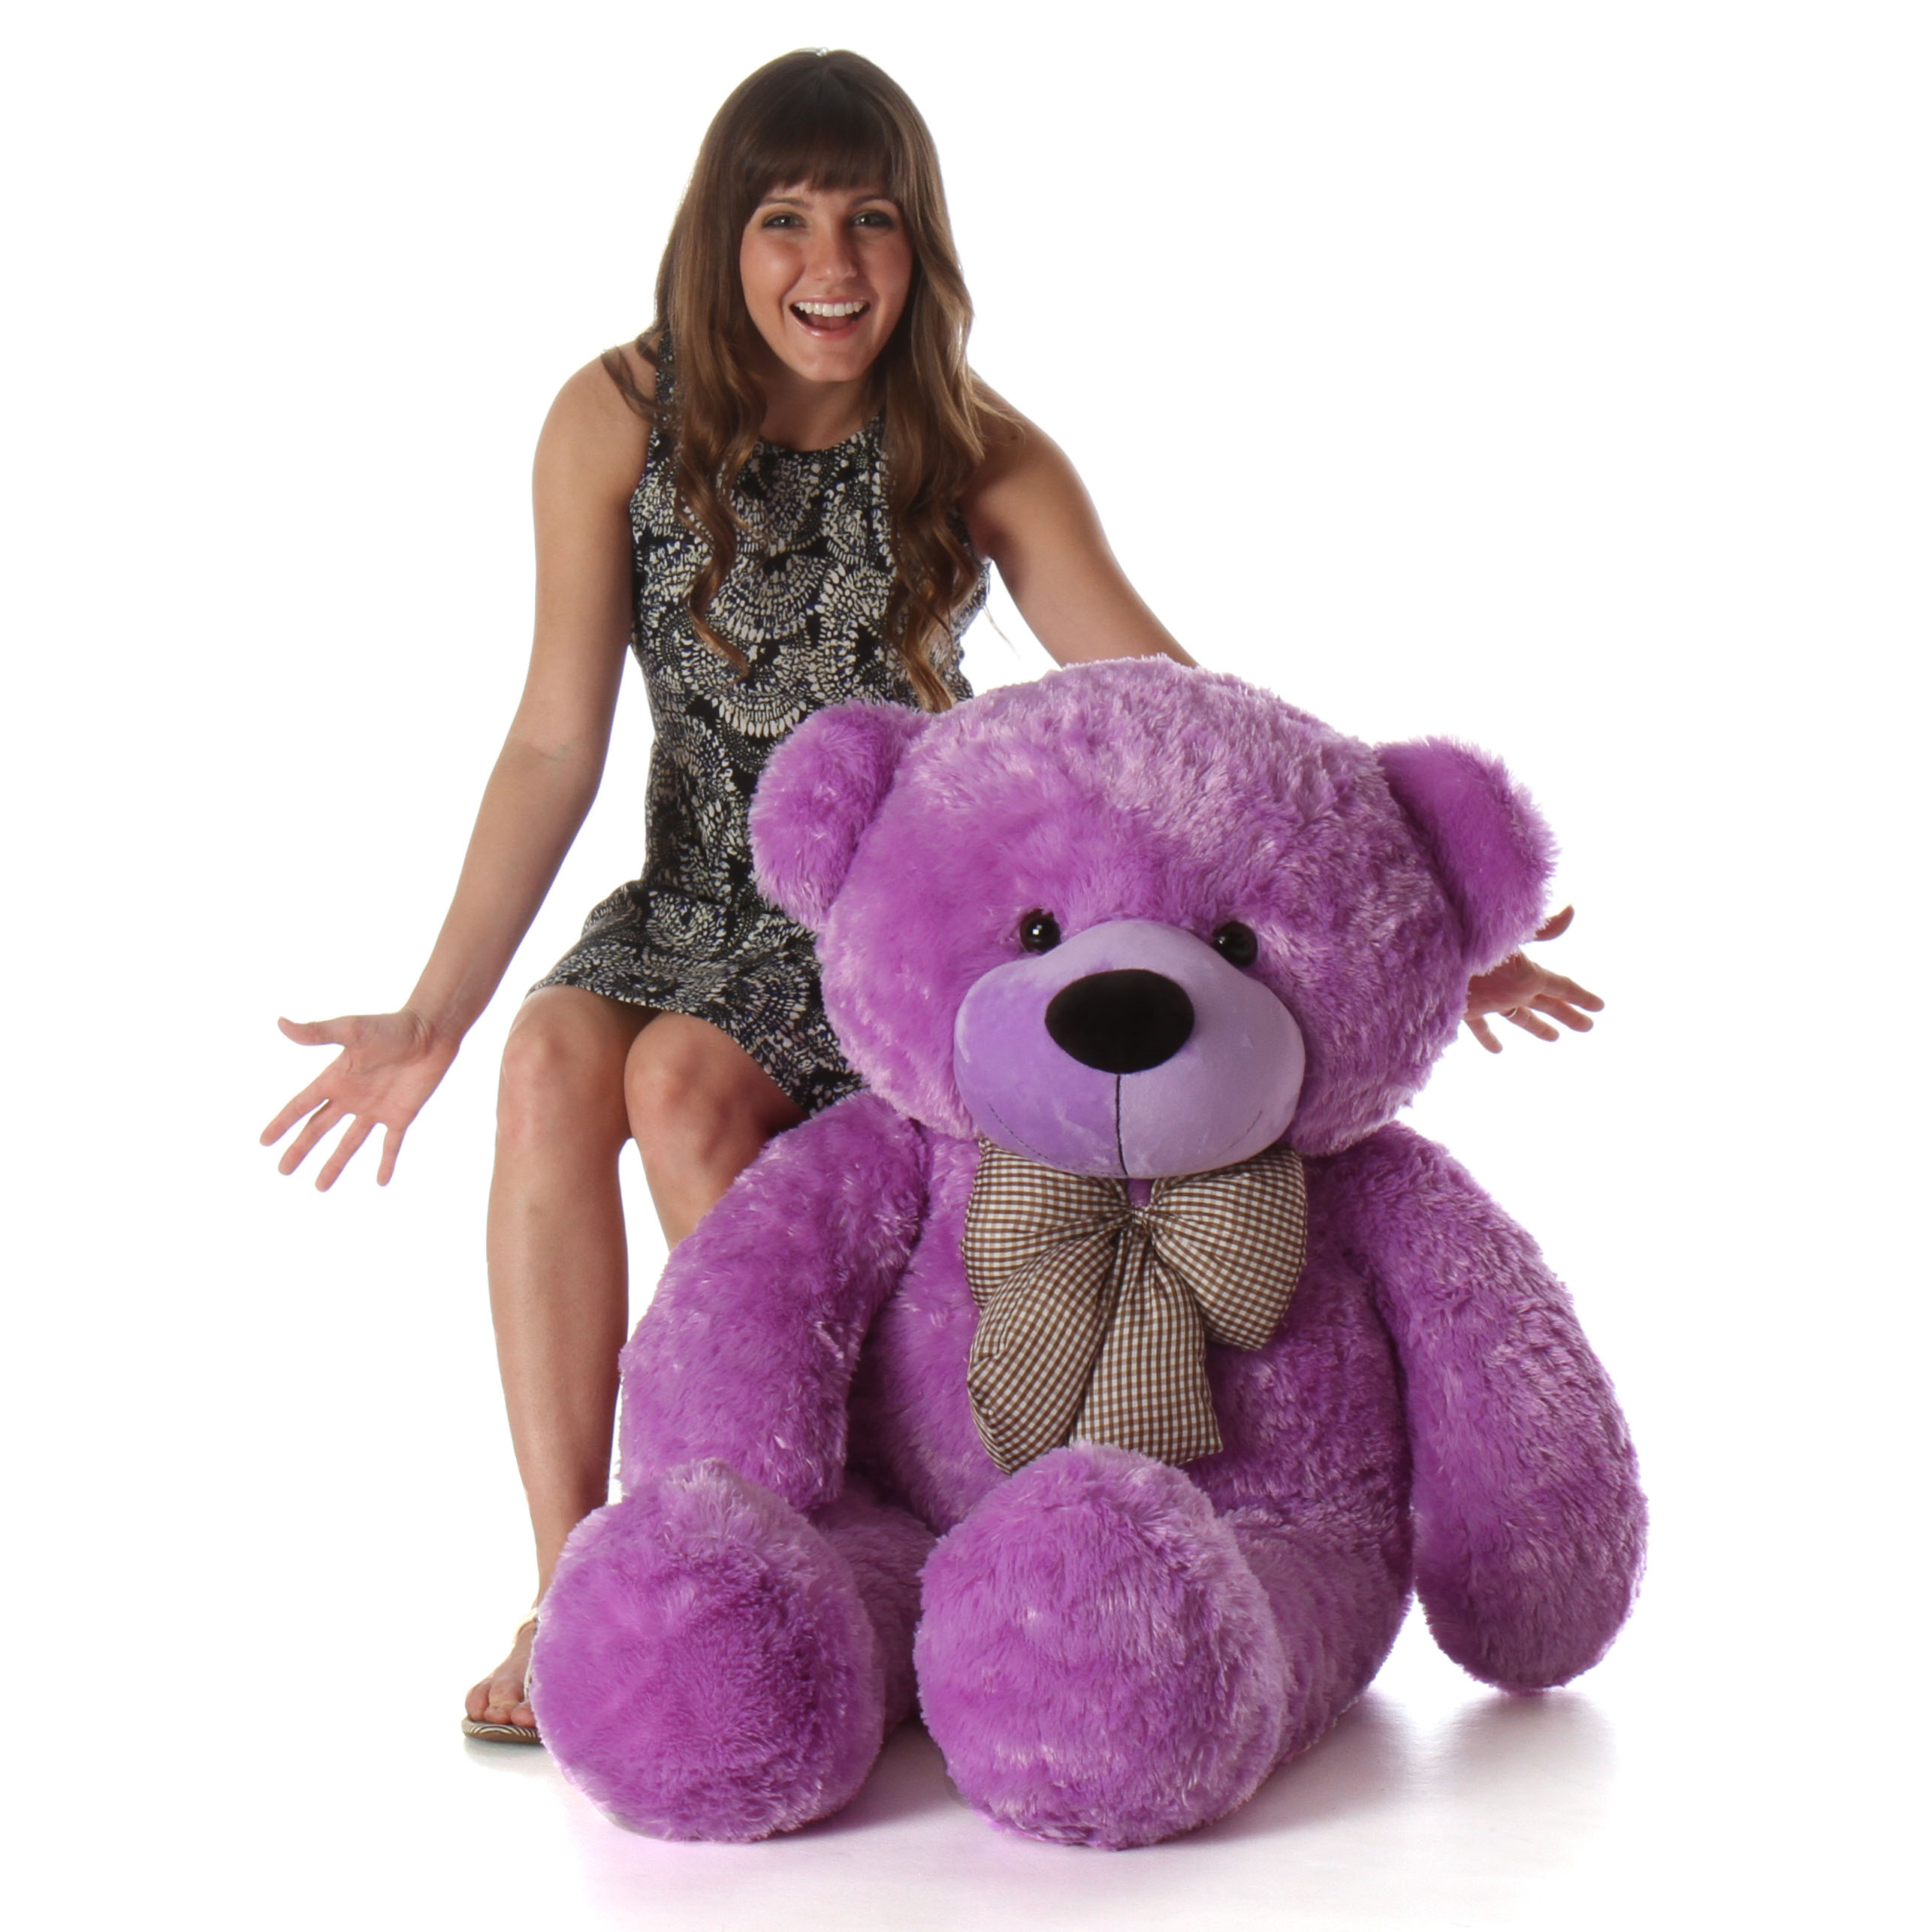 48in-huge-purple-teddy-bear-deedee-cuddles-is-so-soft-and-snuggly-with-beautiful-fur.jpg